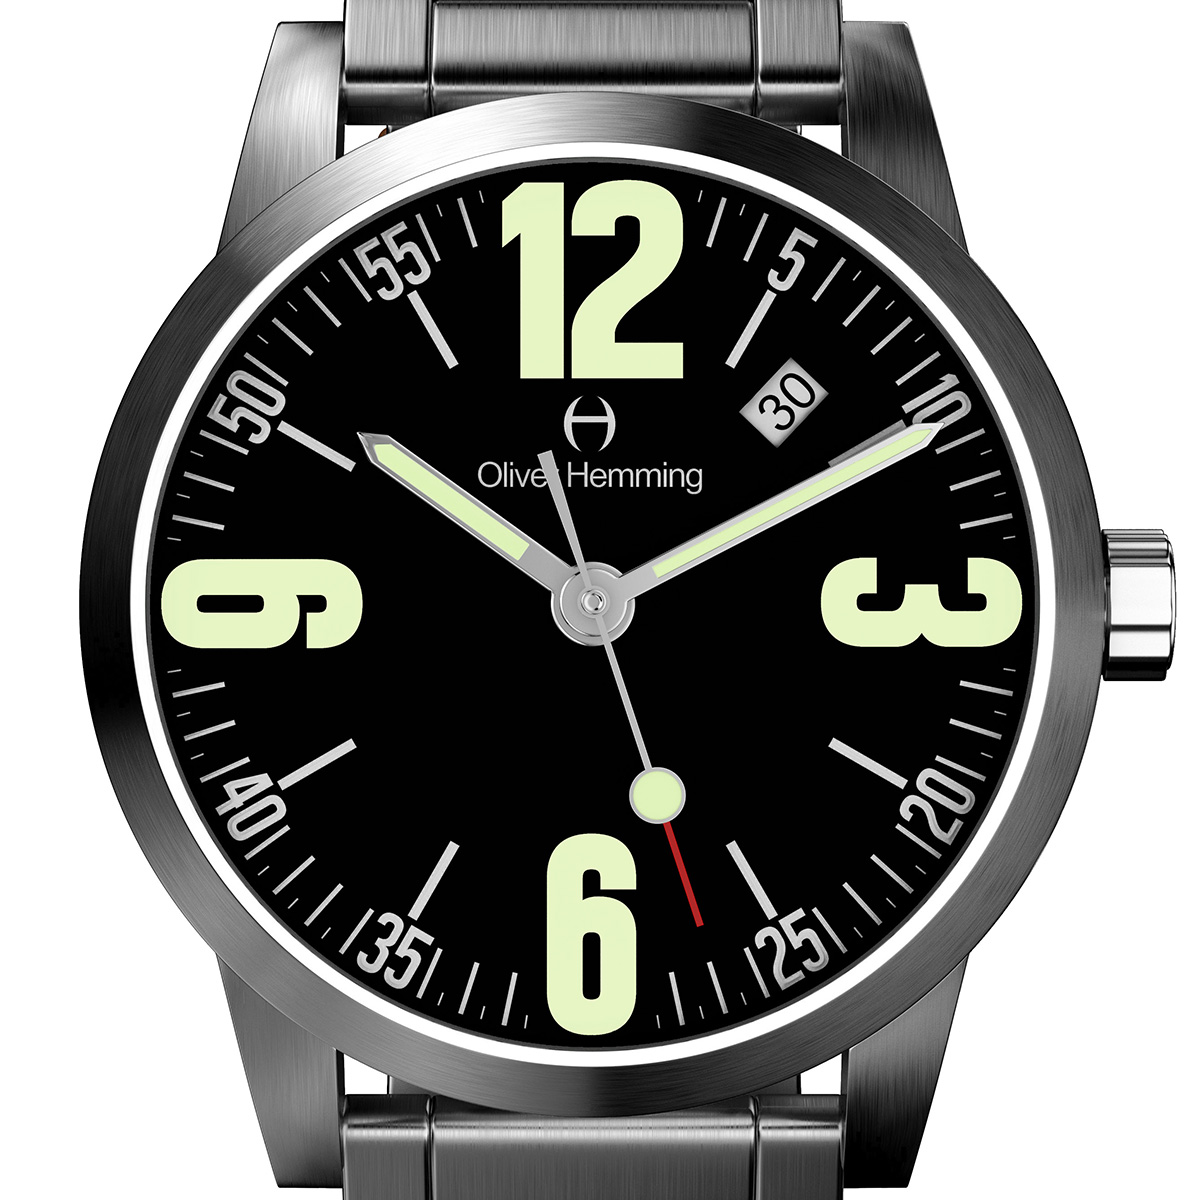 Oliver Hemming オリバーヘミング クォーツ 腕時計 イギリス アート デザイン [WT17SB66BCDSB] 正規代理店品 純正ケース メーカー保証